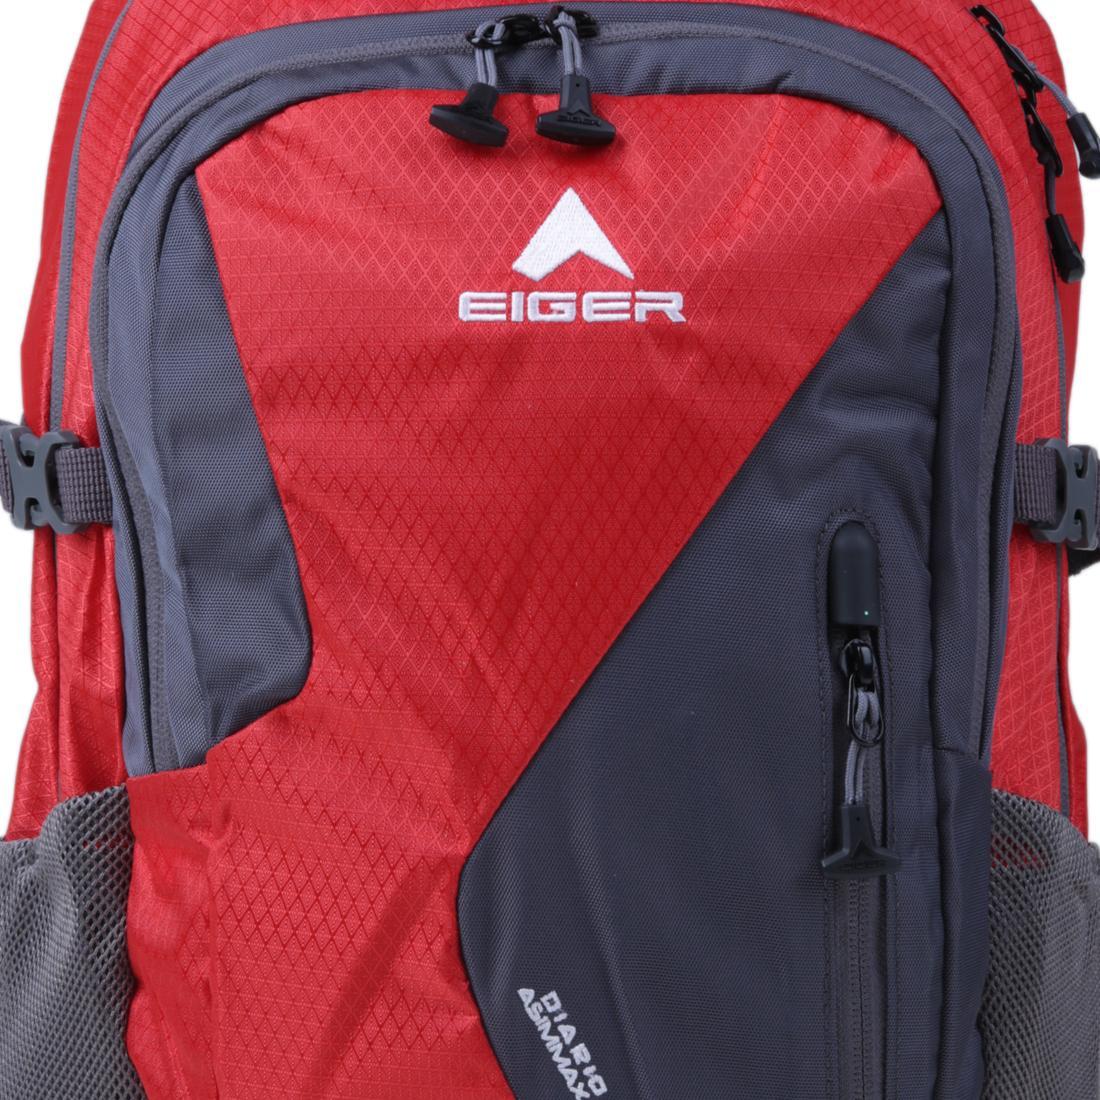 Kelebihan Eiger Diario Asimmax 23l Merah Abu Terkini Daftar Harga Tas Laptop 5